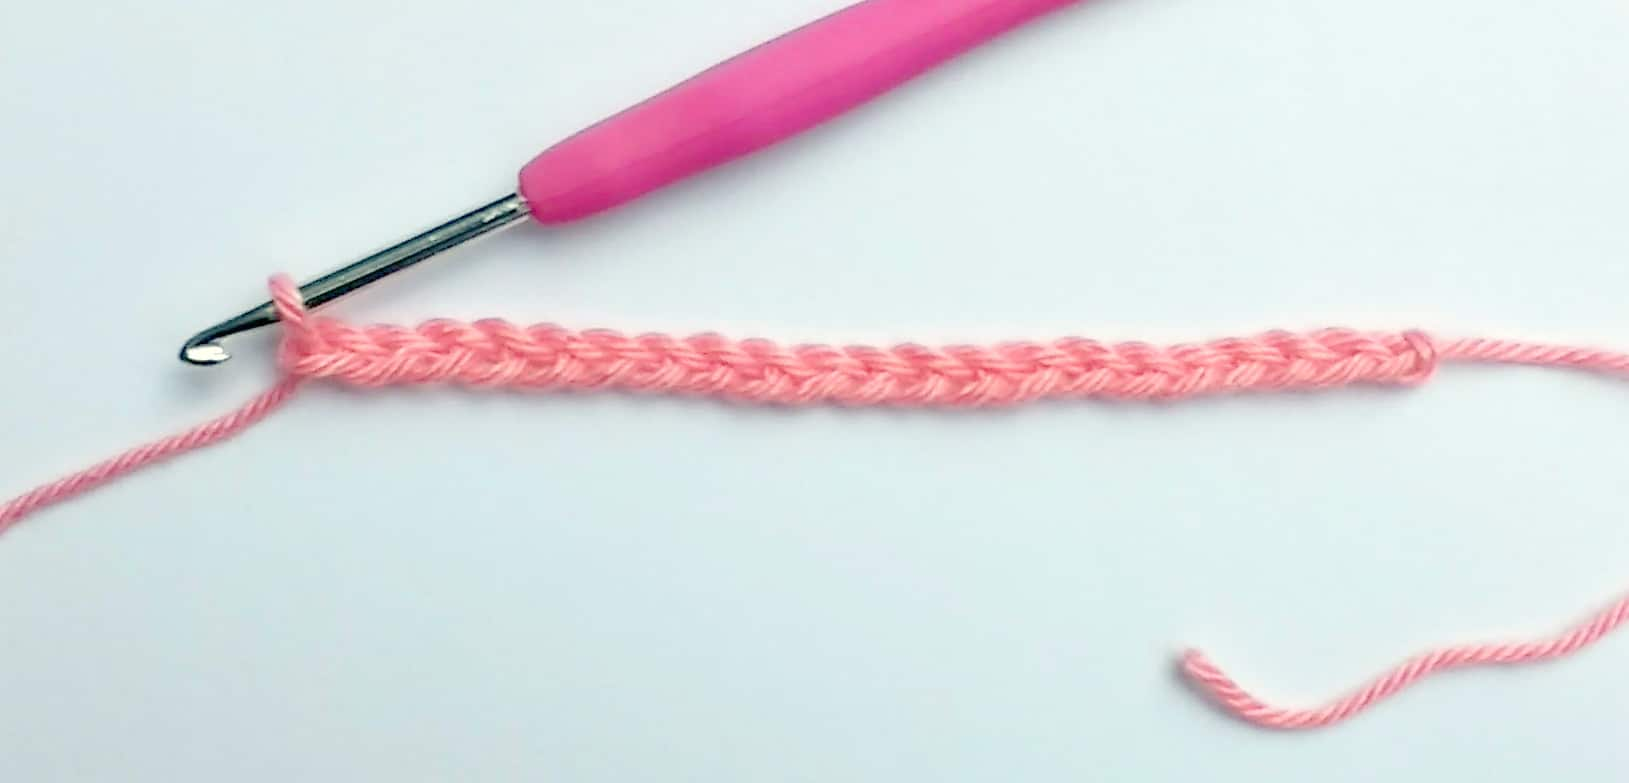 silt crochet stitch